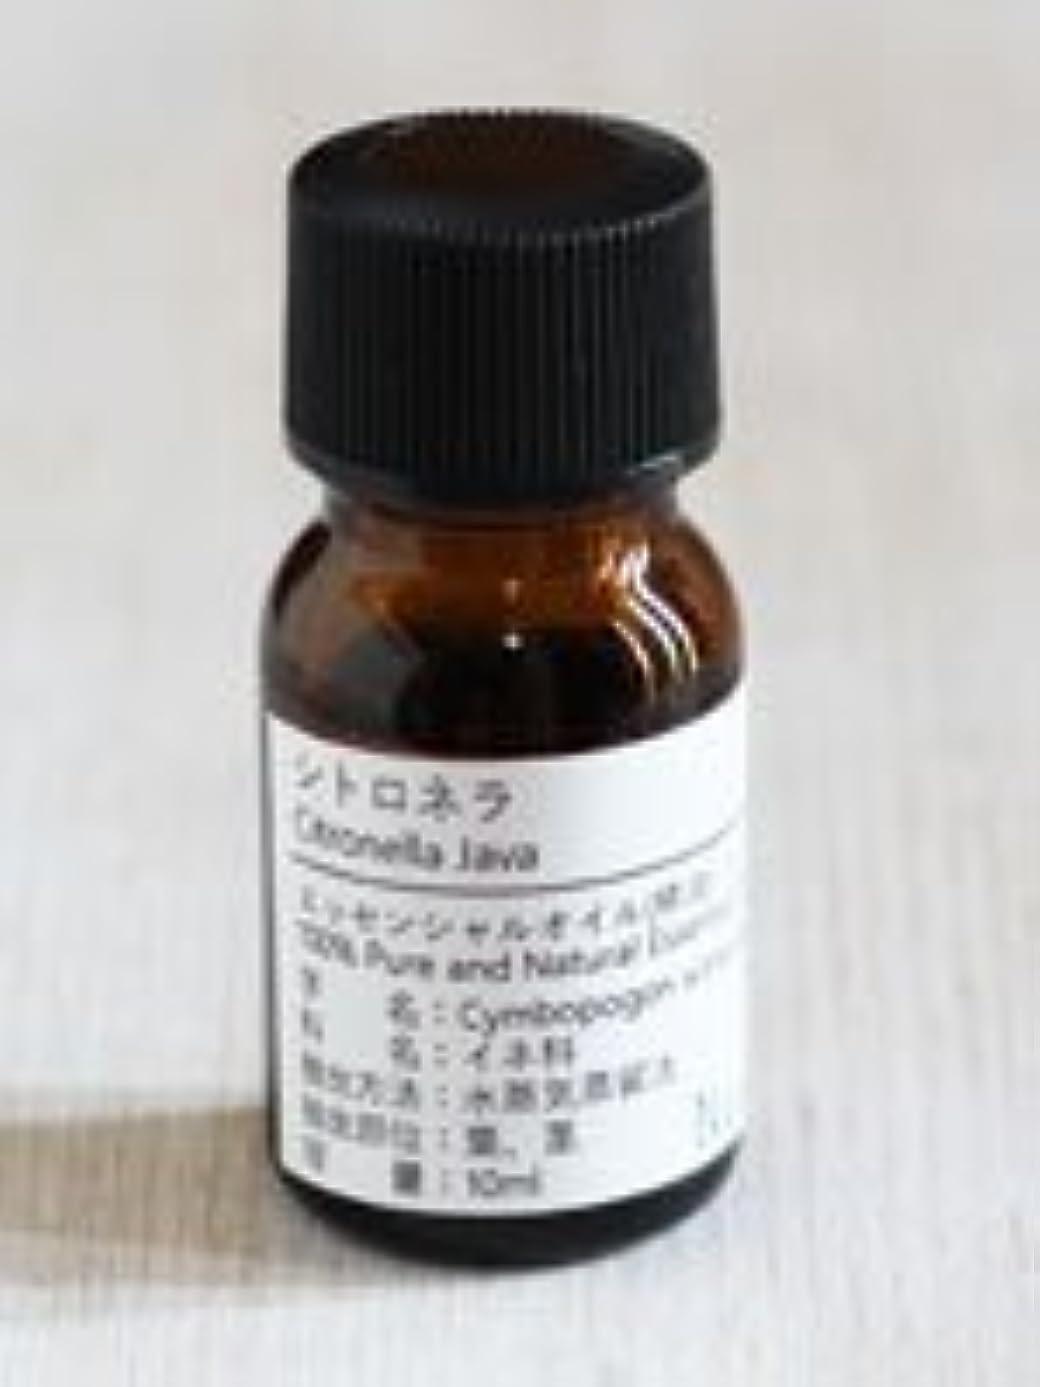 Natural蒼 シトロネラ/エッセンシャルオイル 精油天然100% (10ml)